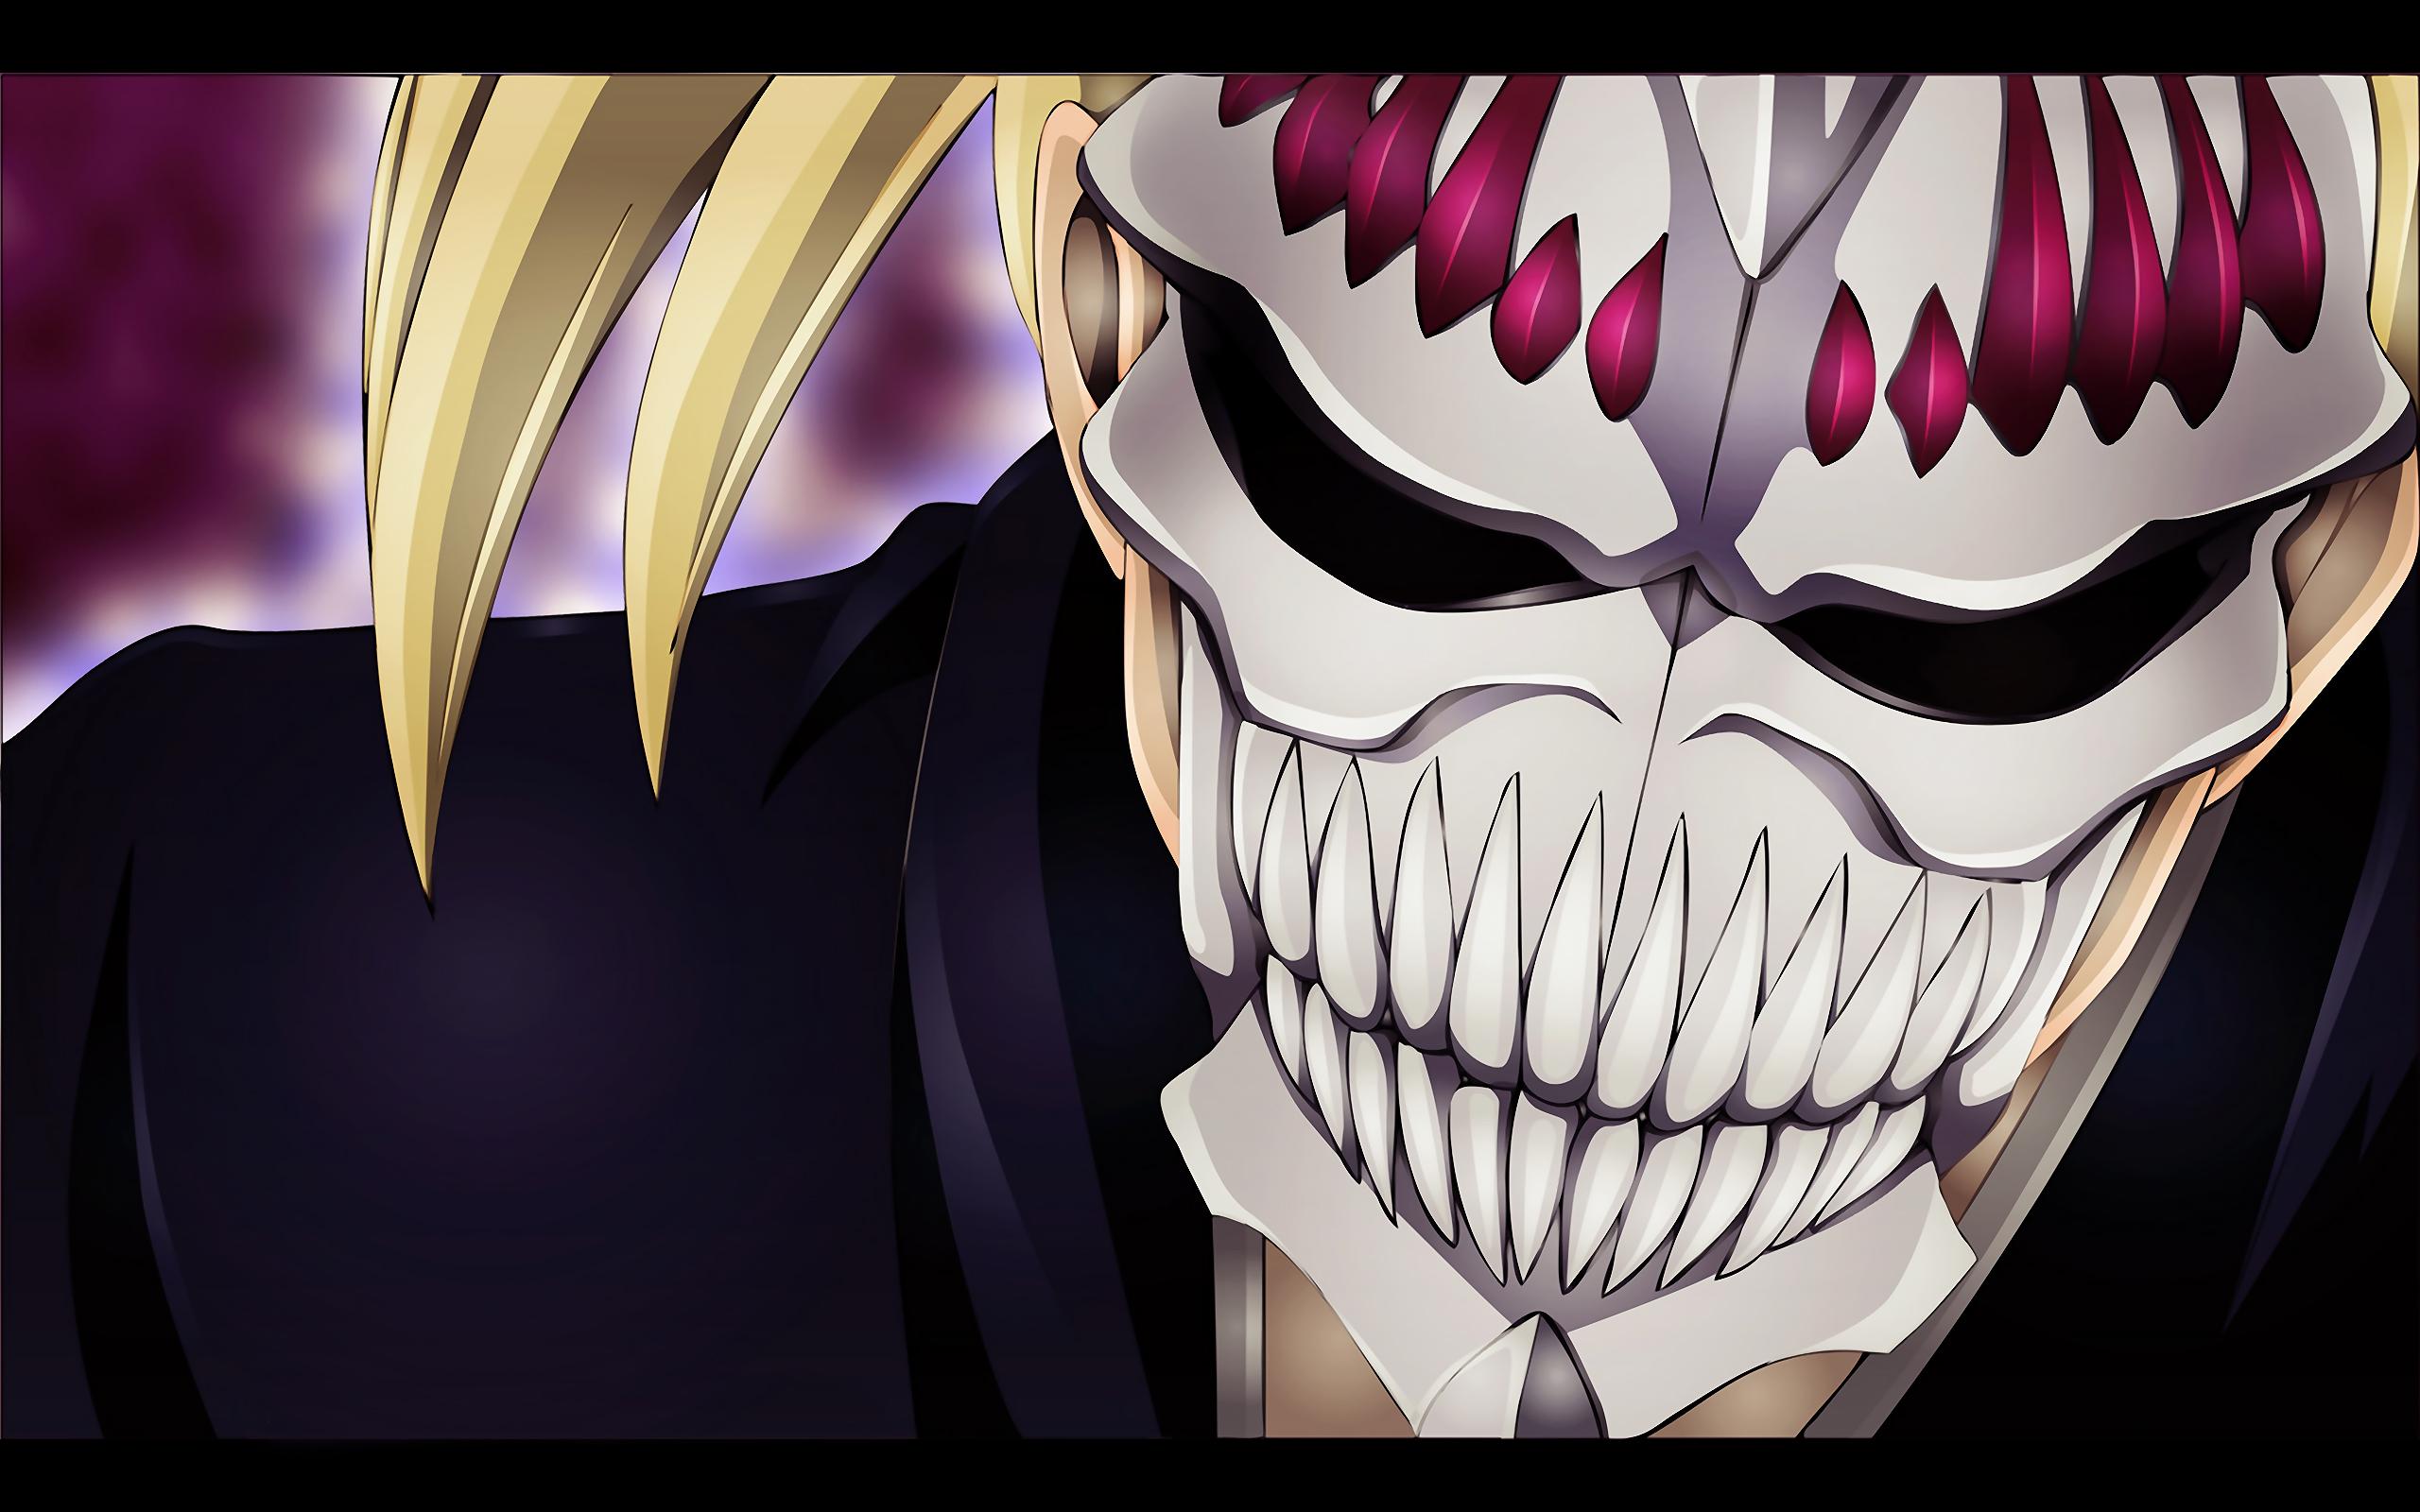 Bleach vizard hollow mask sarugaki hiyori wallpaper 2560x1600 199170 wallpaperup - Ichigo vizard mask ...